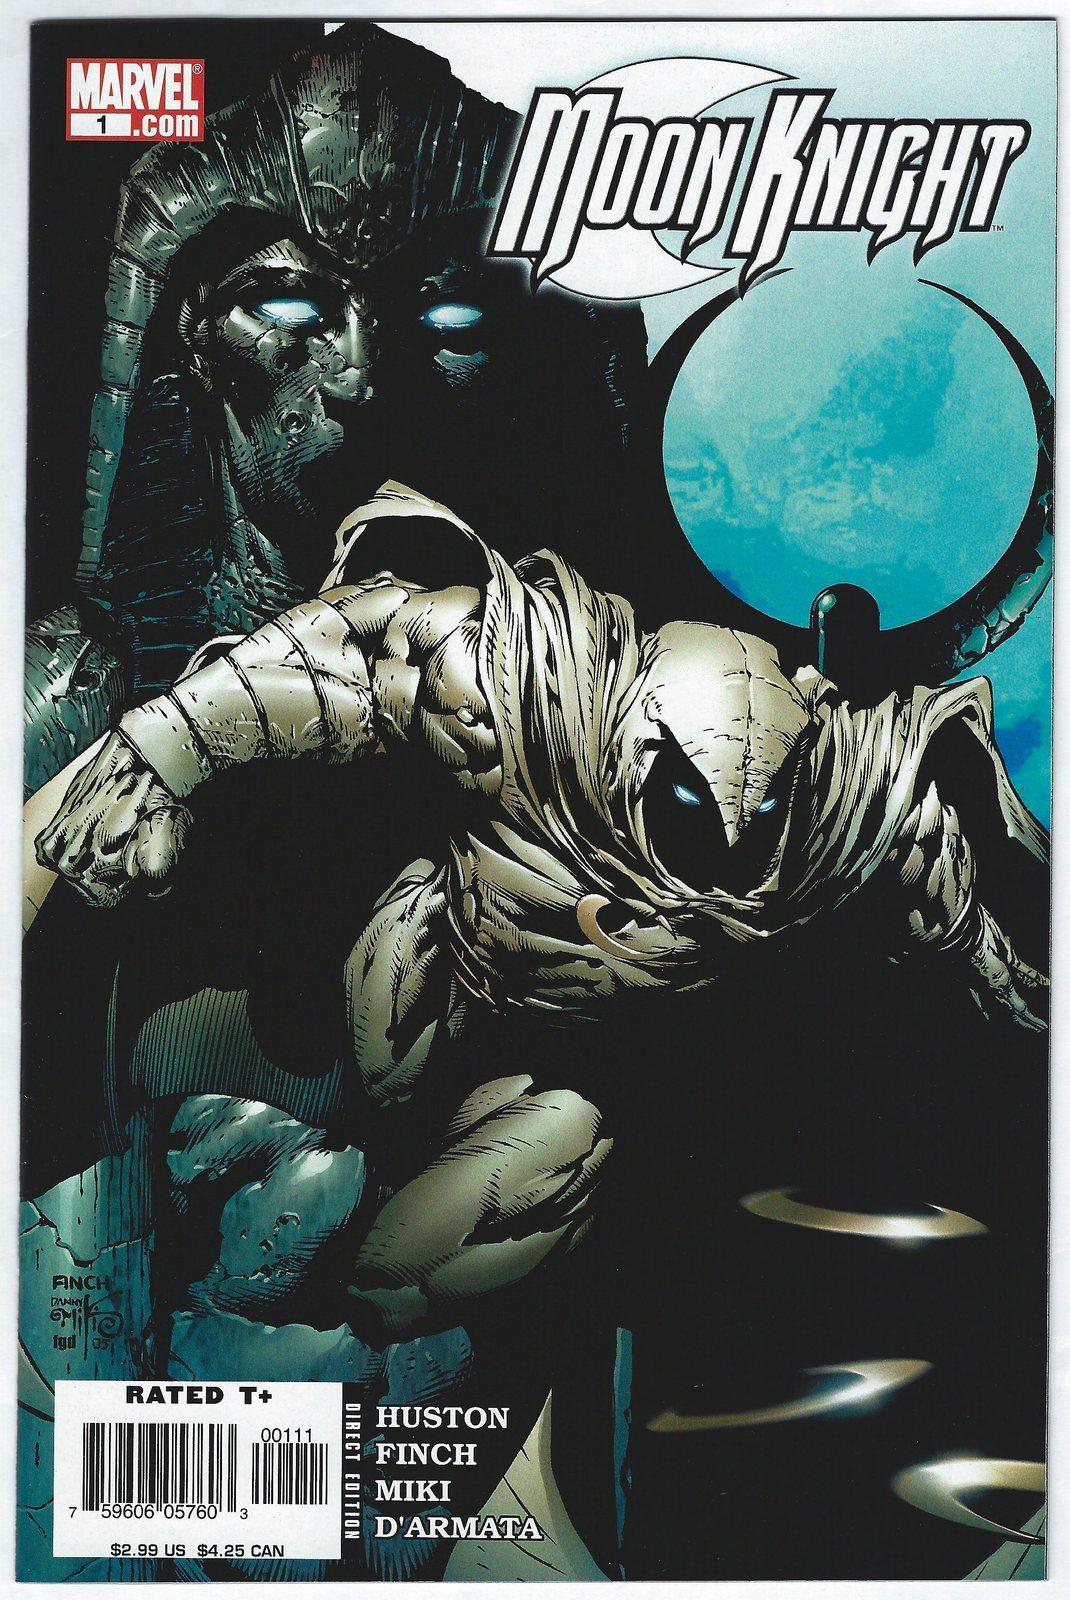 MOON KNIGHT #196 2018 MARVEL Comics ~ VF//NM Comic Book